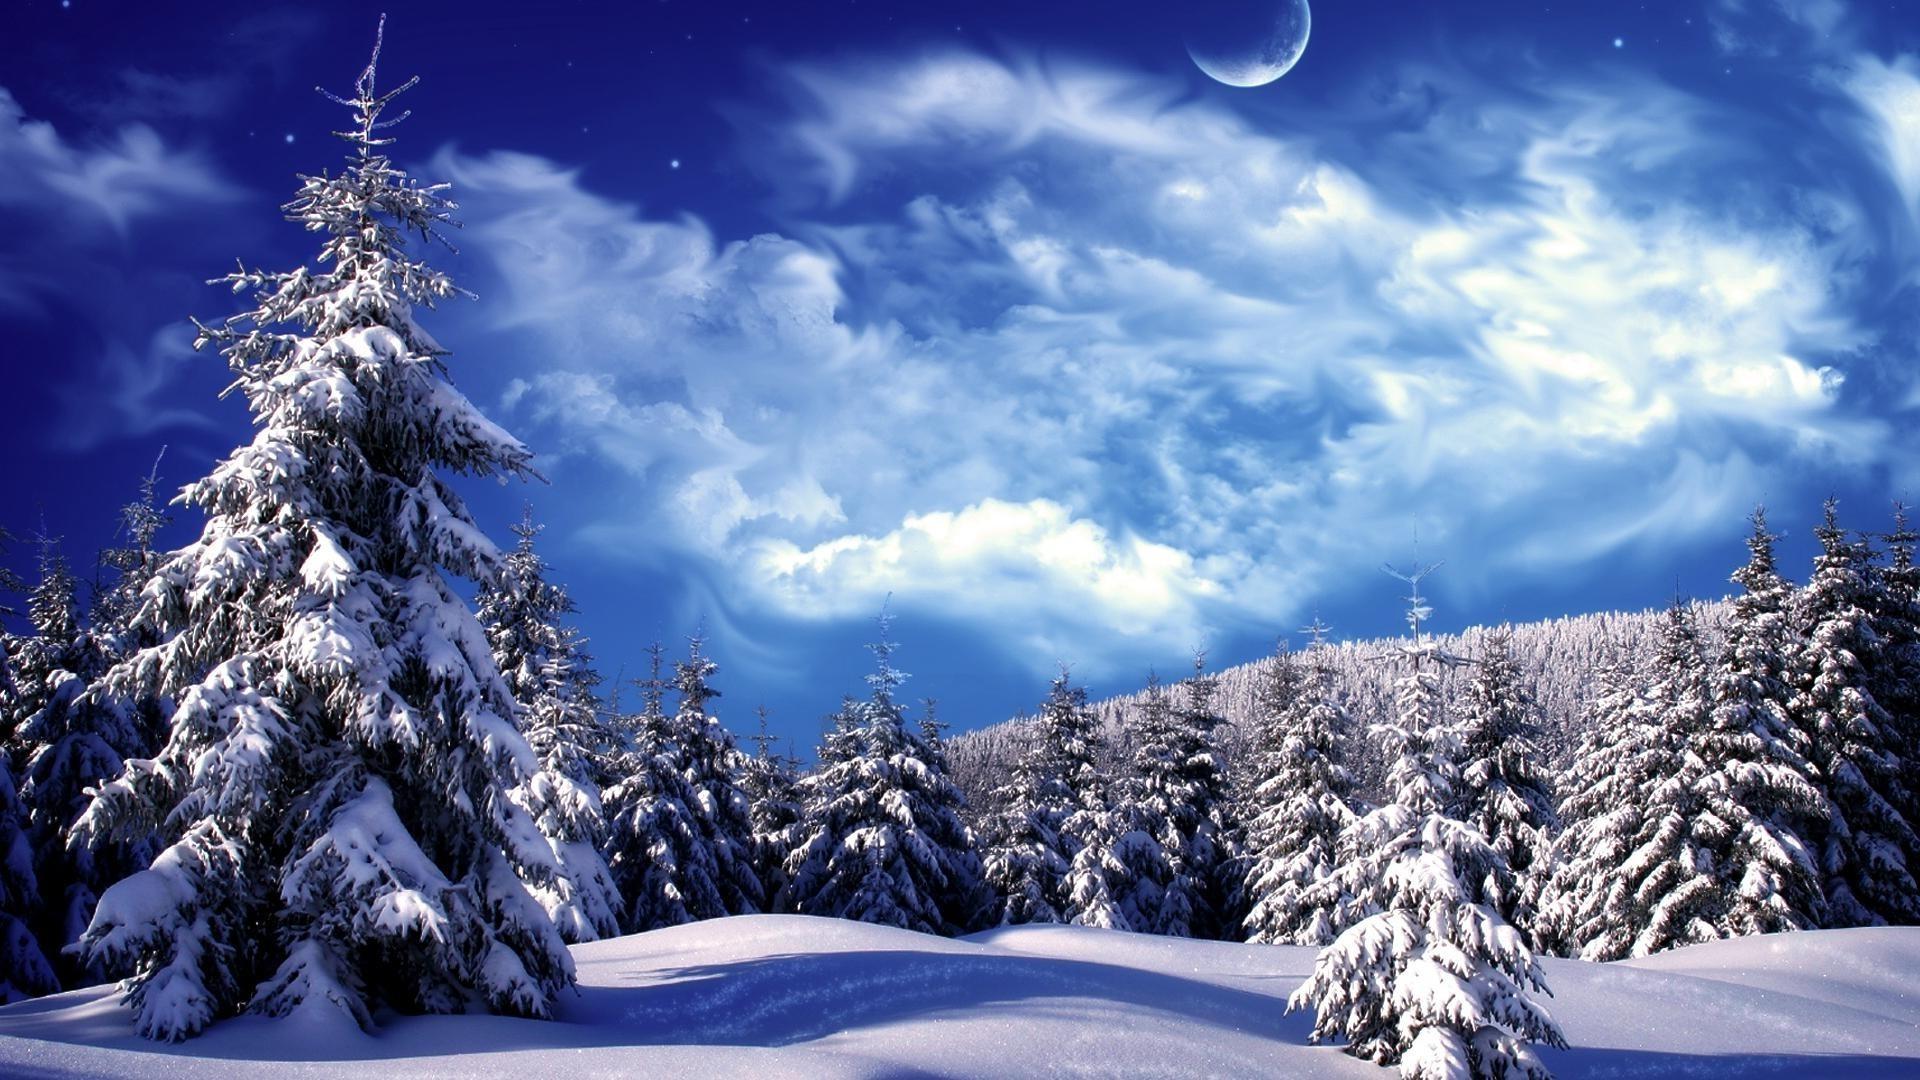 Beautiful winter wallpaper photos Winter pictures Pexels Free Stock Photos